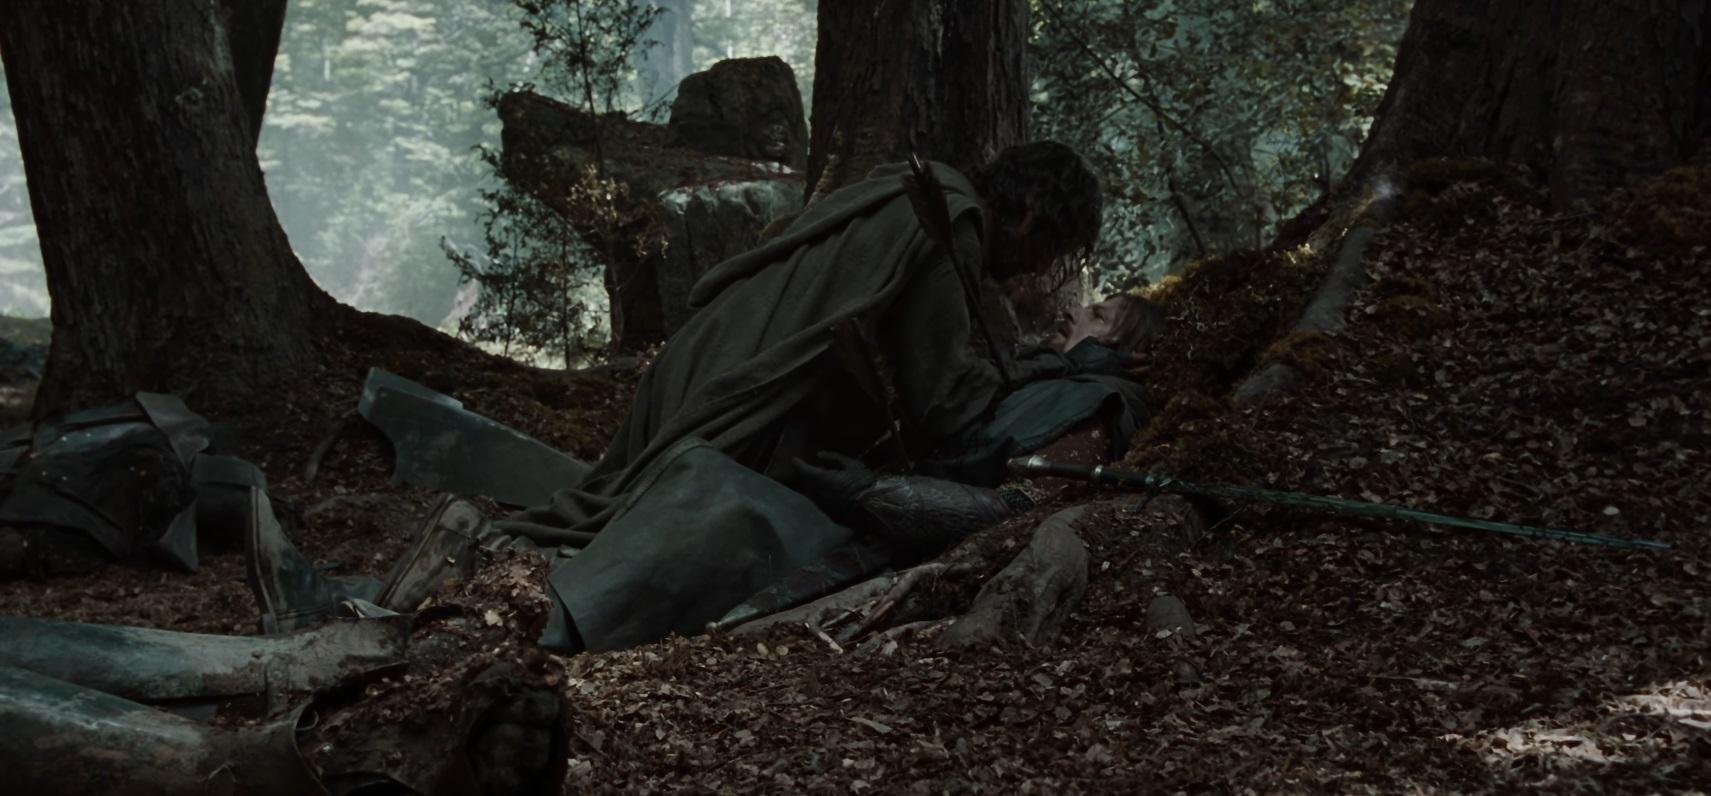 Aragorn II Elessar | The One Wiki to Rule Them All | FANDOM